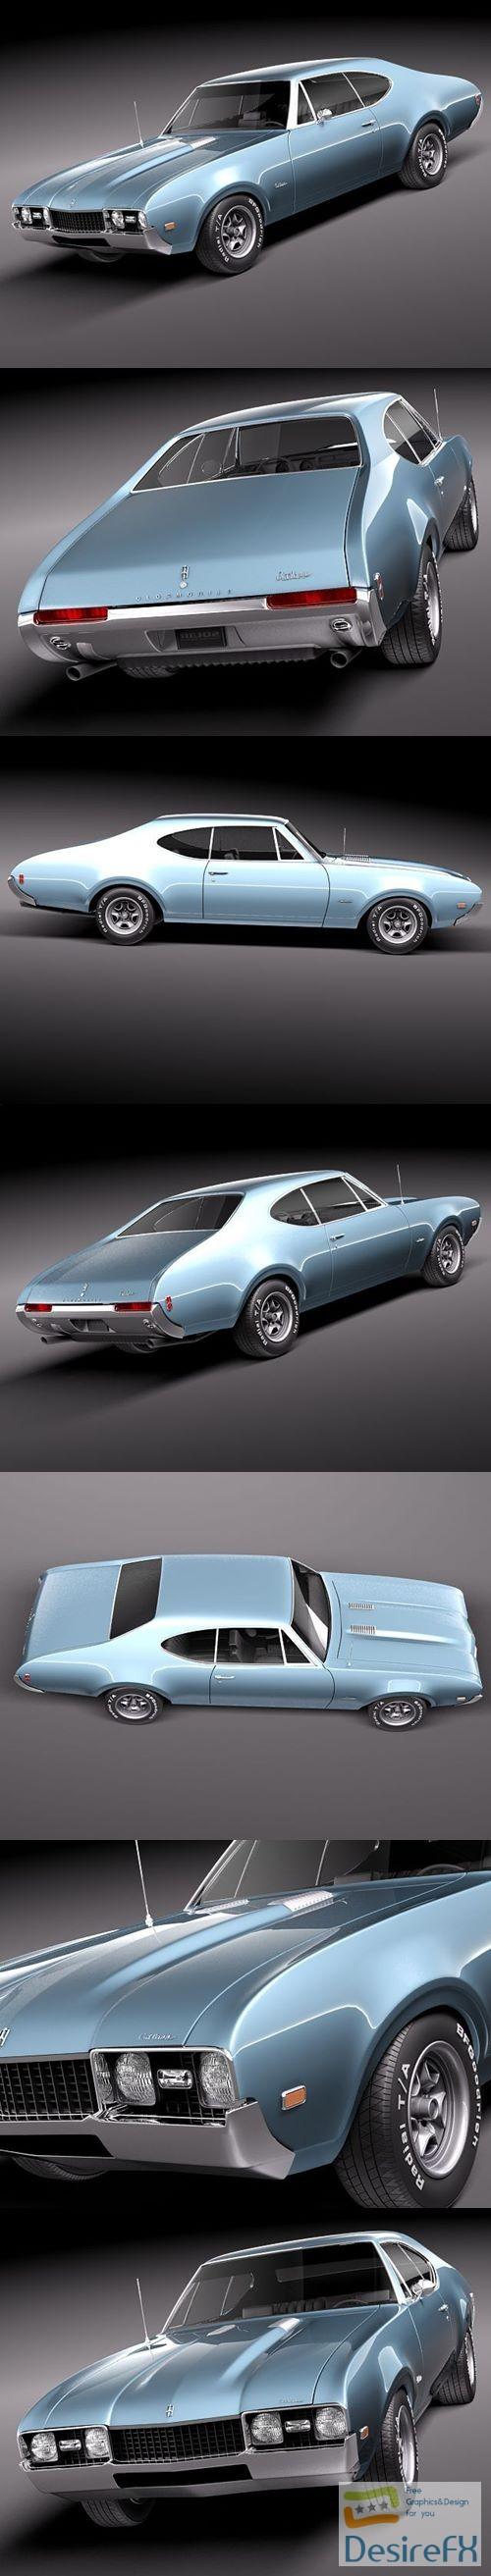 3d-models - Oldsmobile 442 Cutlass 1968 3D Model